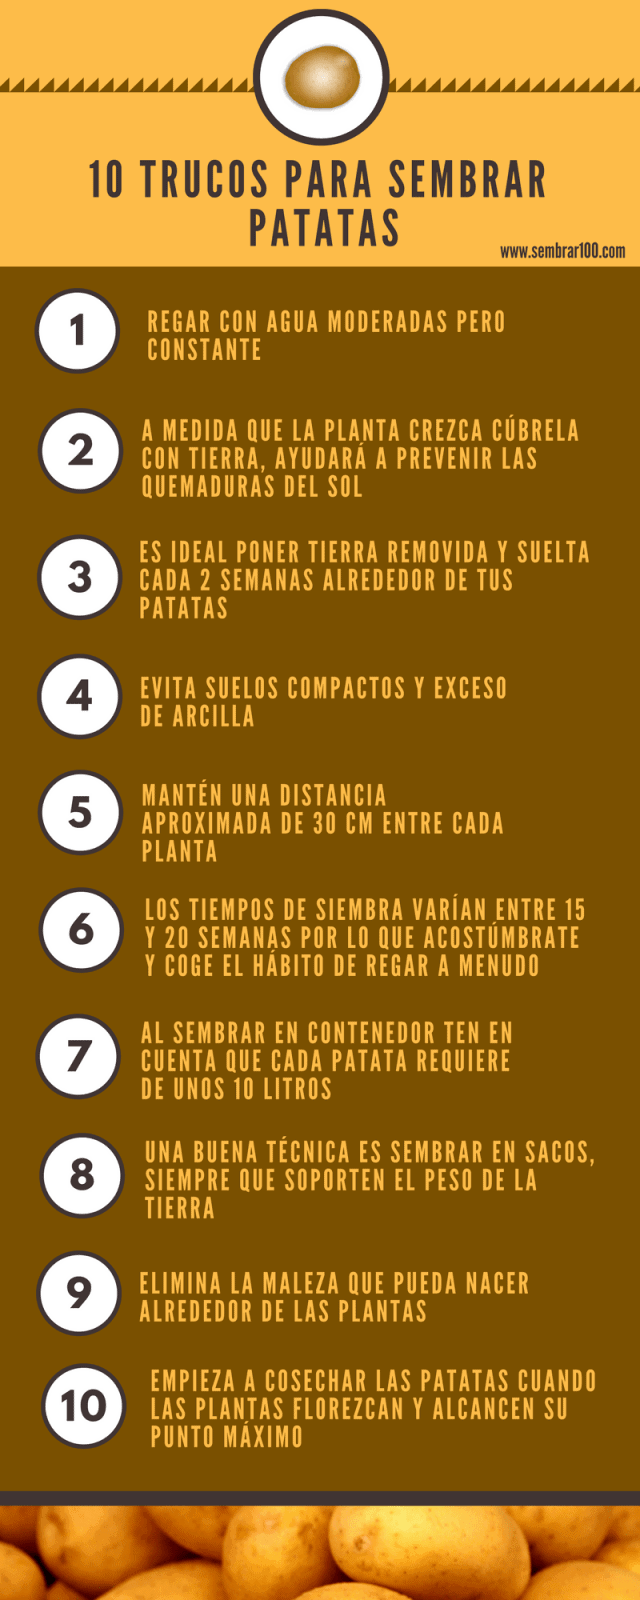 TRUCOS PARA SEMBRAR PATATAS